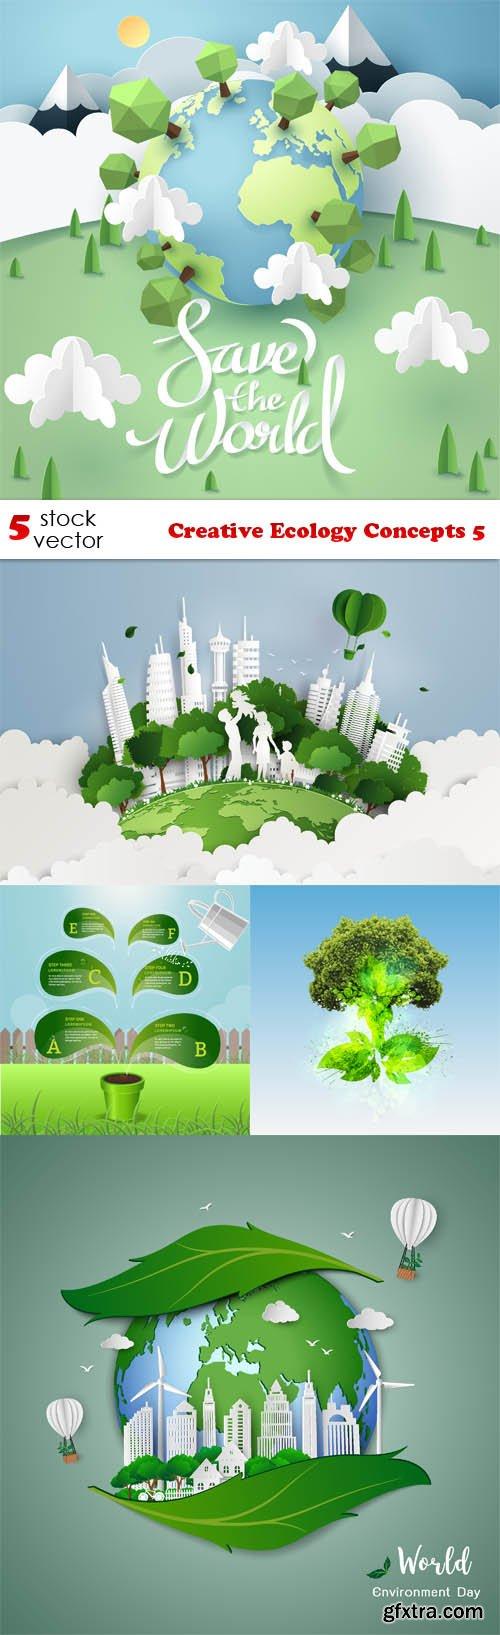 Vectors - Creative Ecology Concepts 5